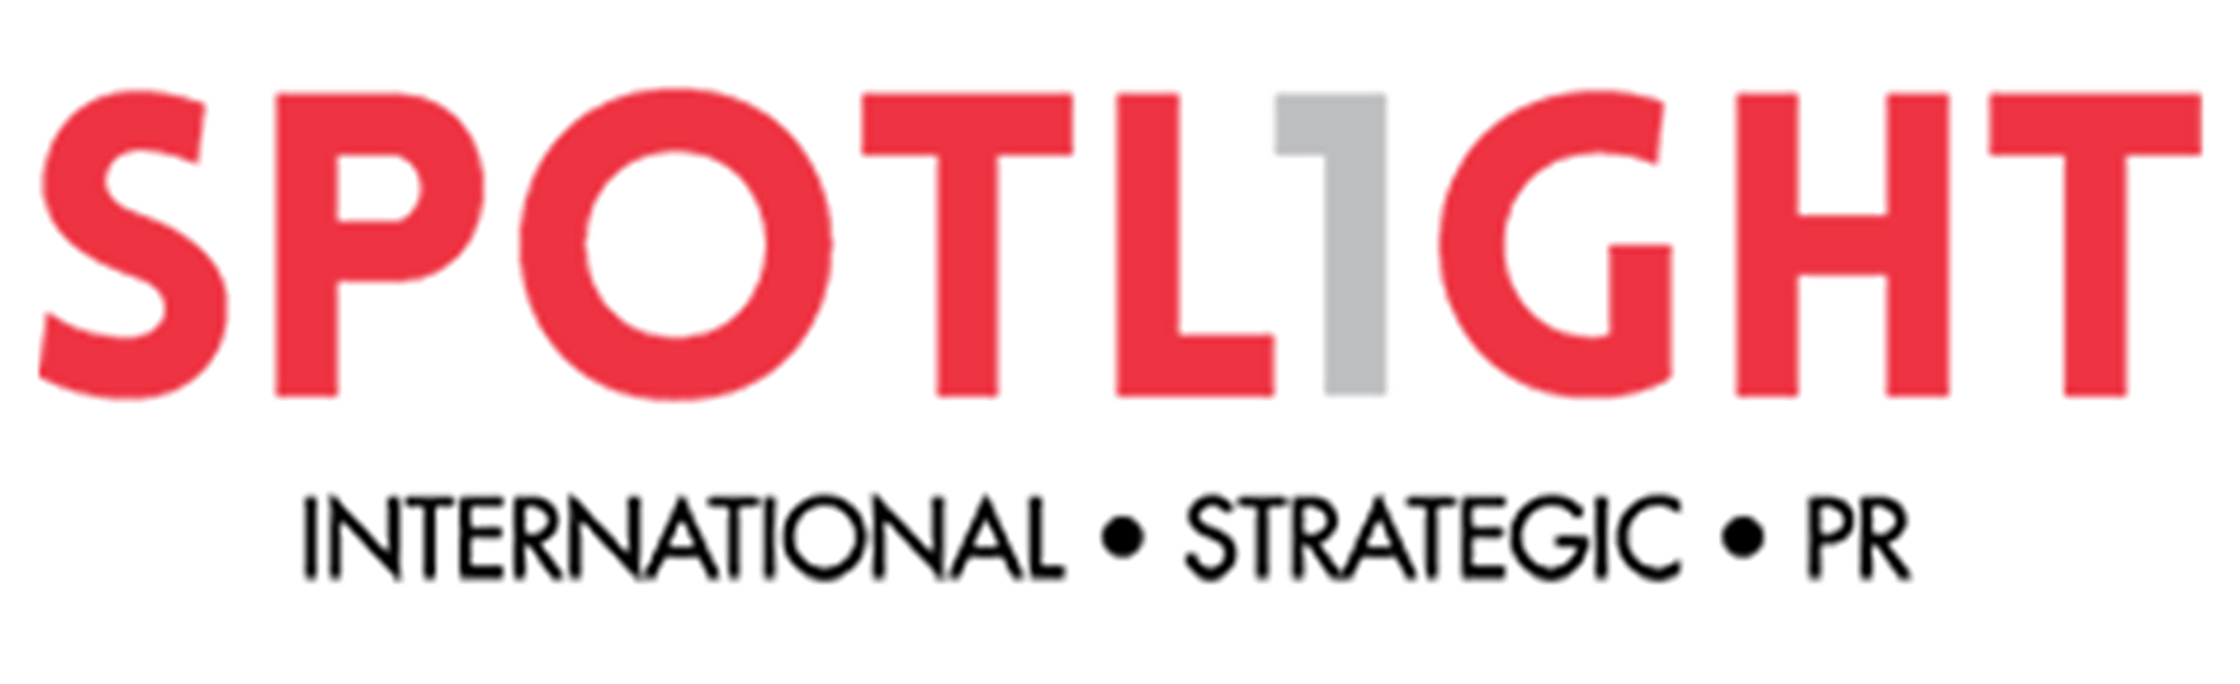 logo-spotl1ght communications pr agency london uk